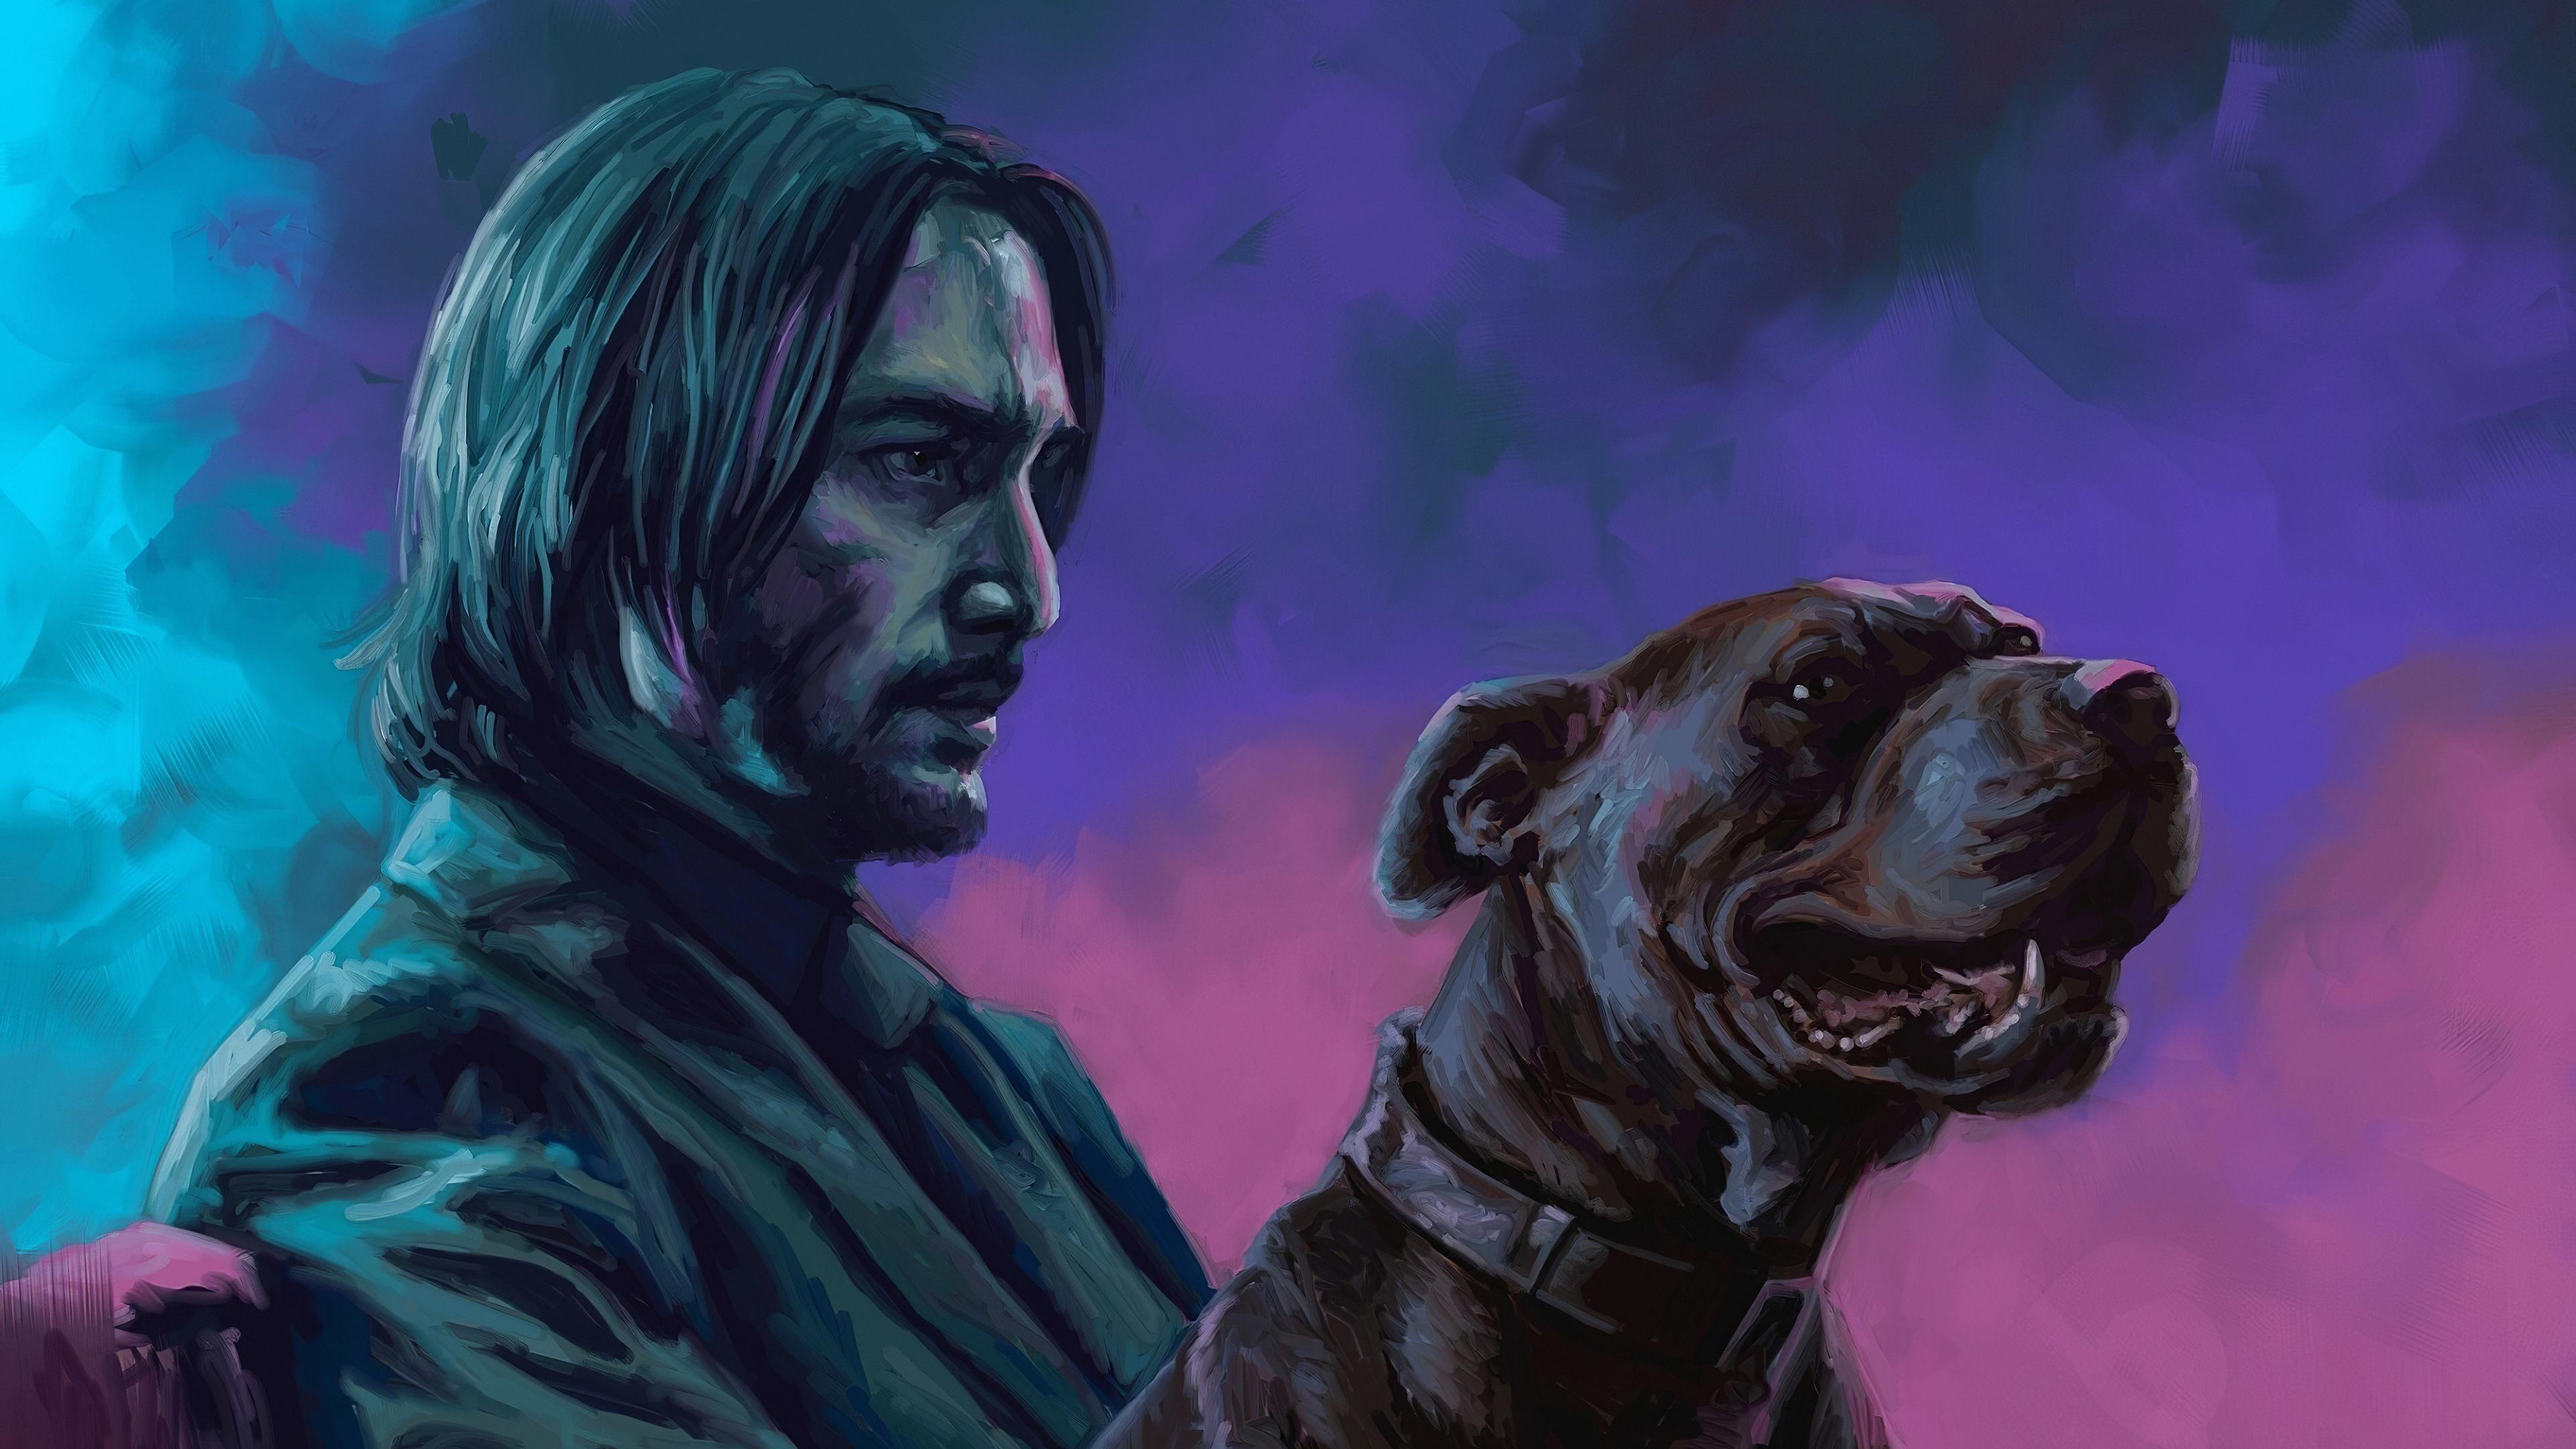 john wick with dog art 1575659371 - John Wick With Dog Art -